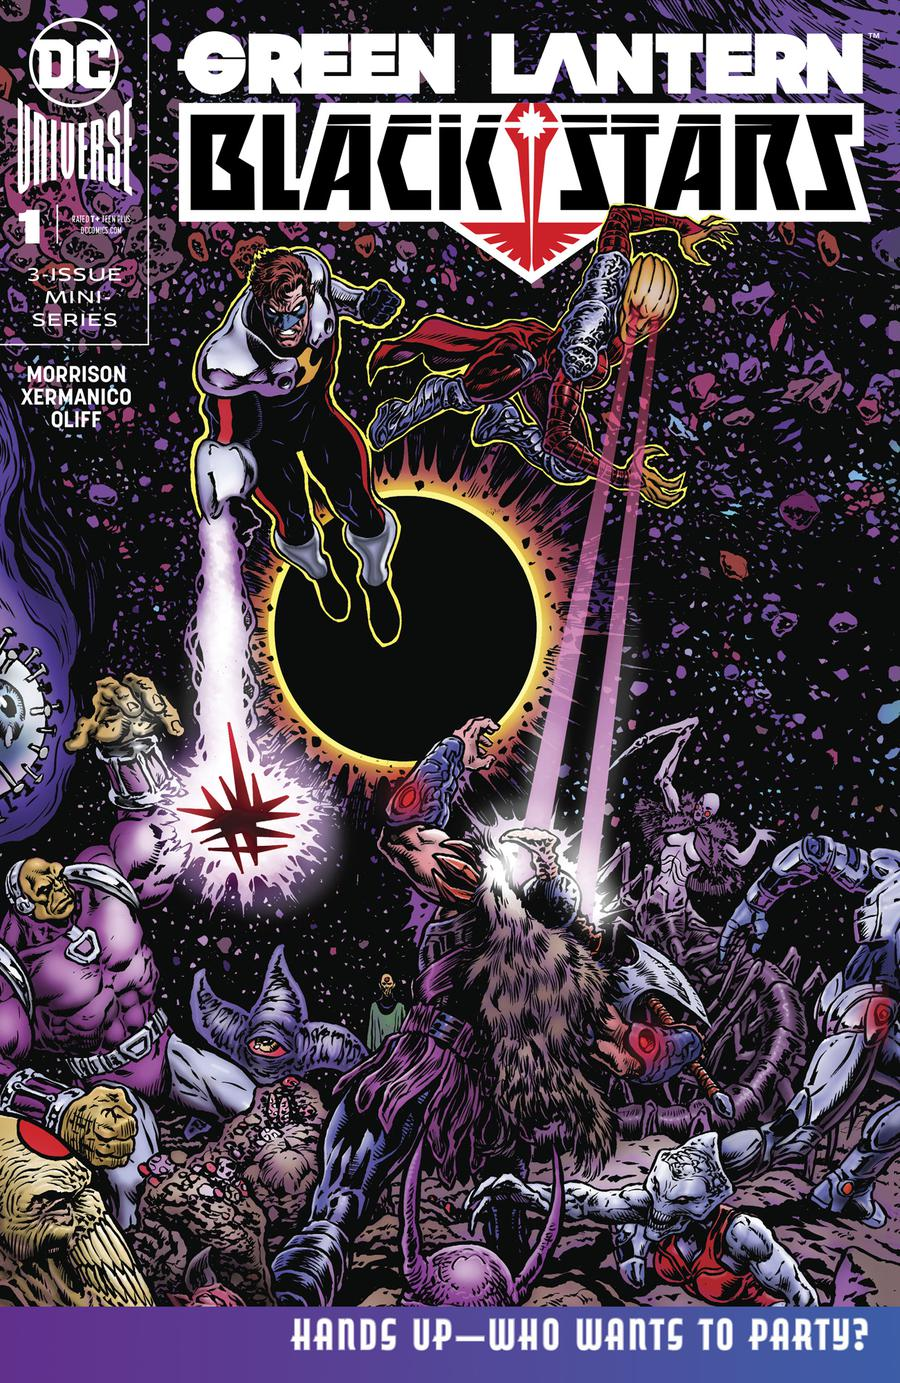 Green Lantern Blackstars #1 Cover A Regular Liam Sharp Cover